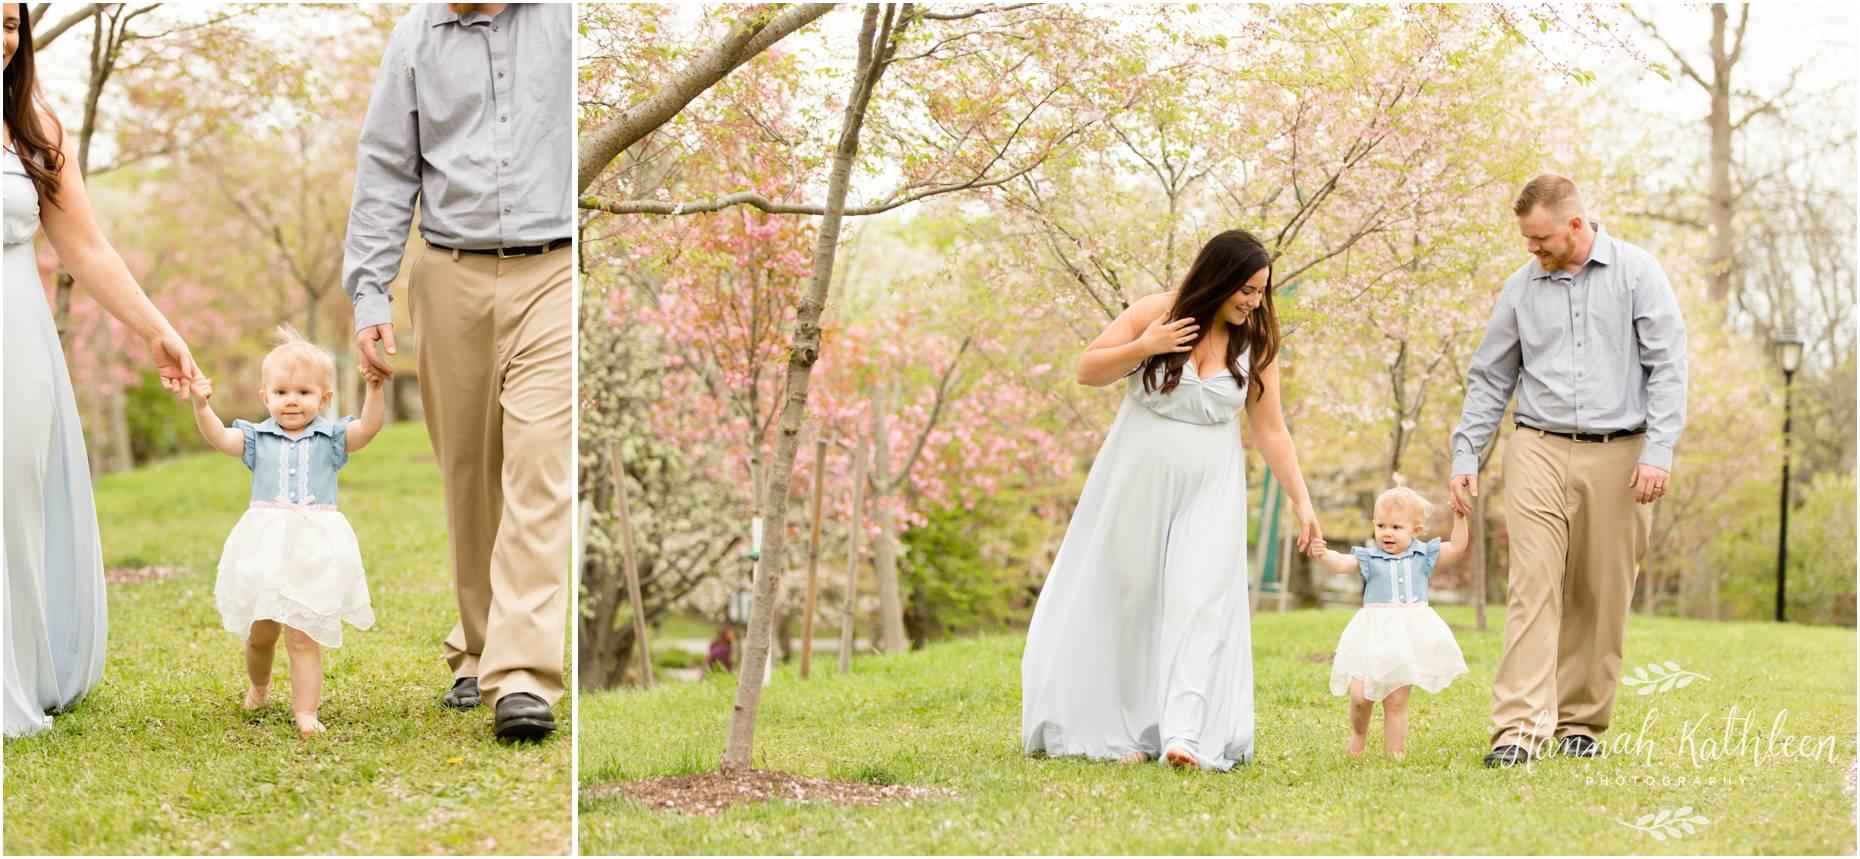 Pennell_Buffalo_Family_Photographer_Cherry_Blossoms_0010.jpg